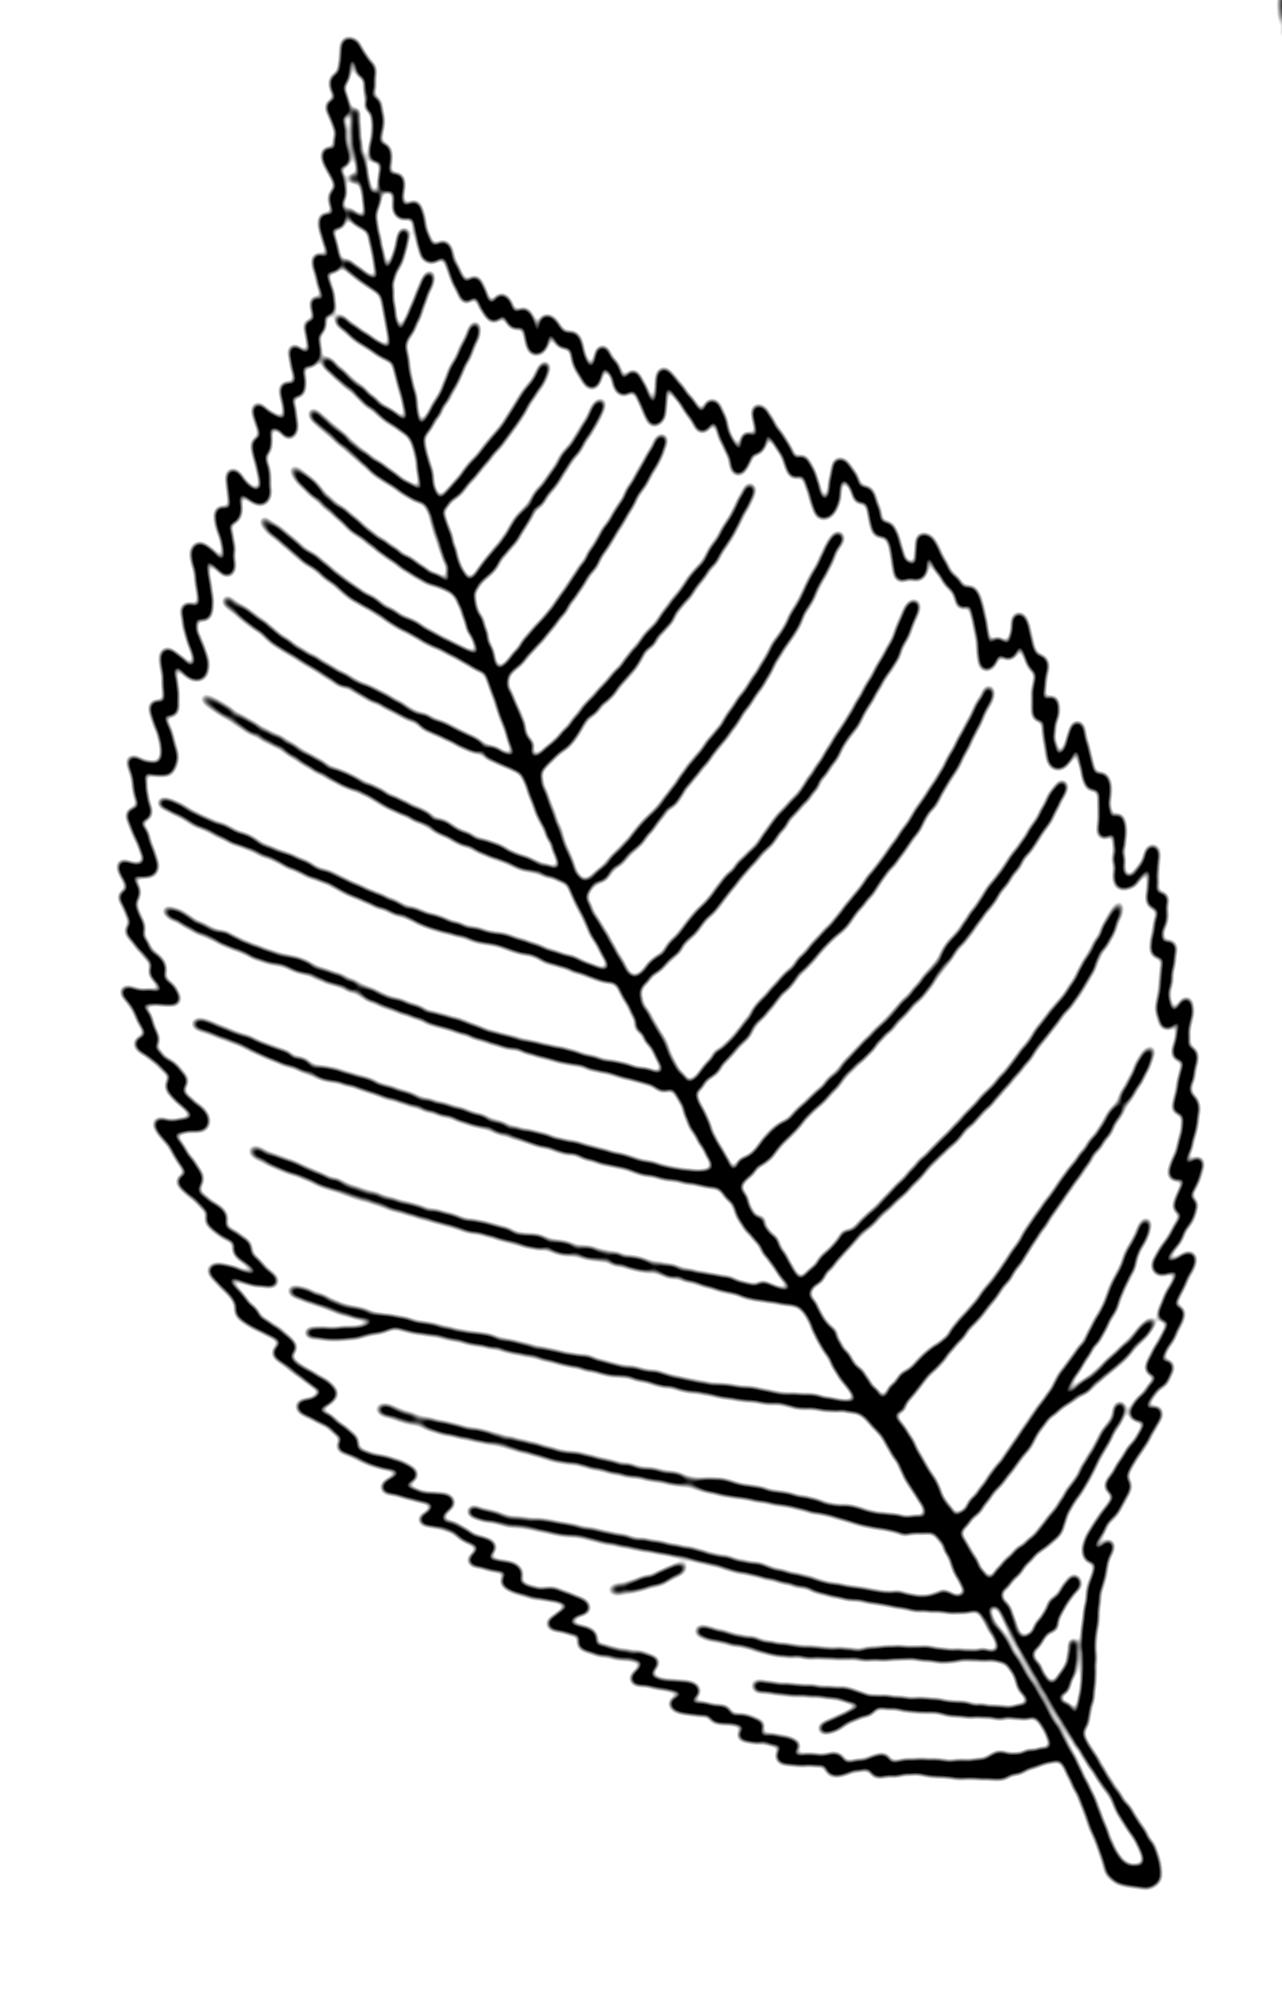 Drawn rose leaves Description Google leaves png free